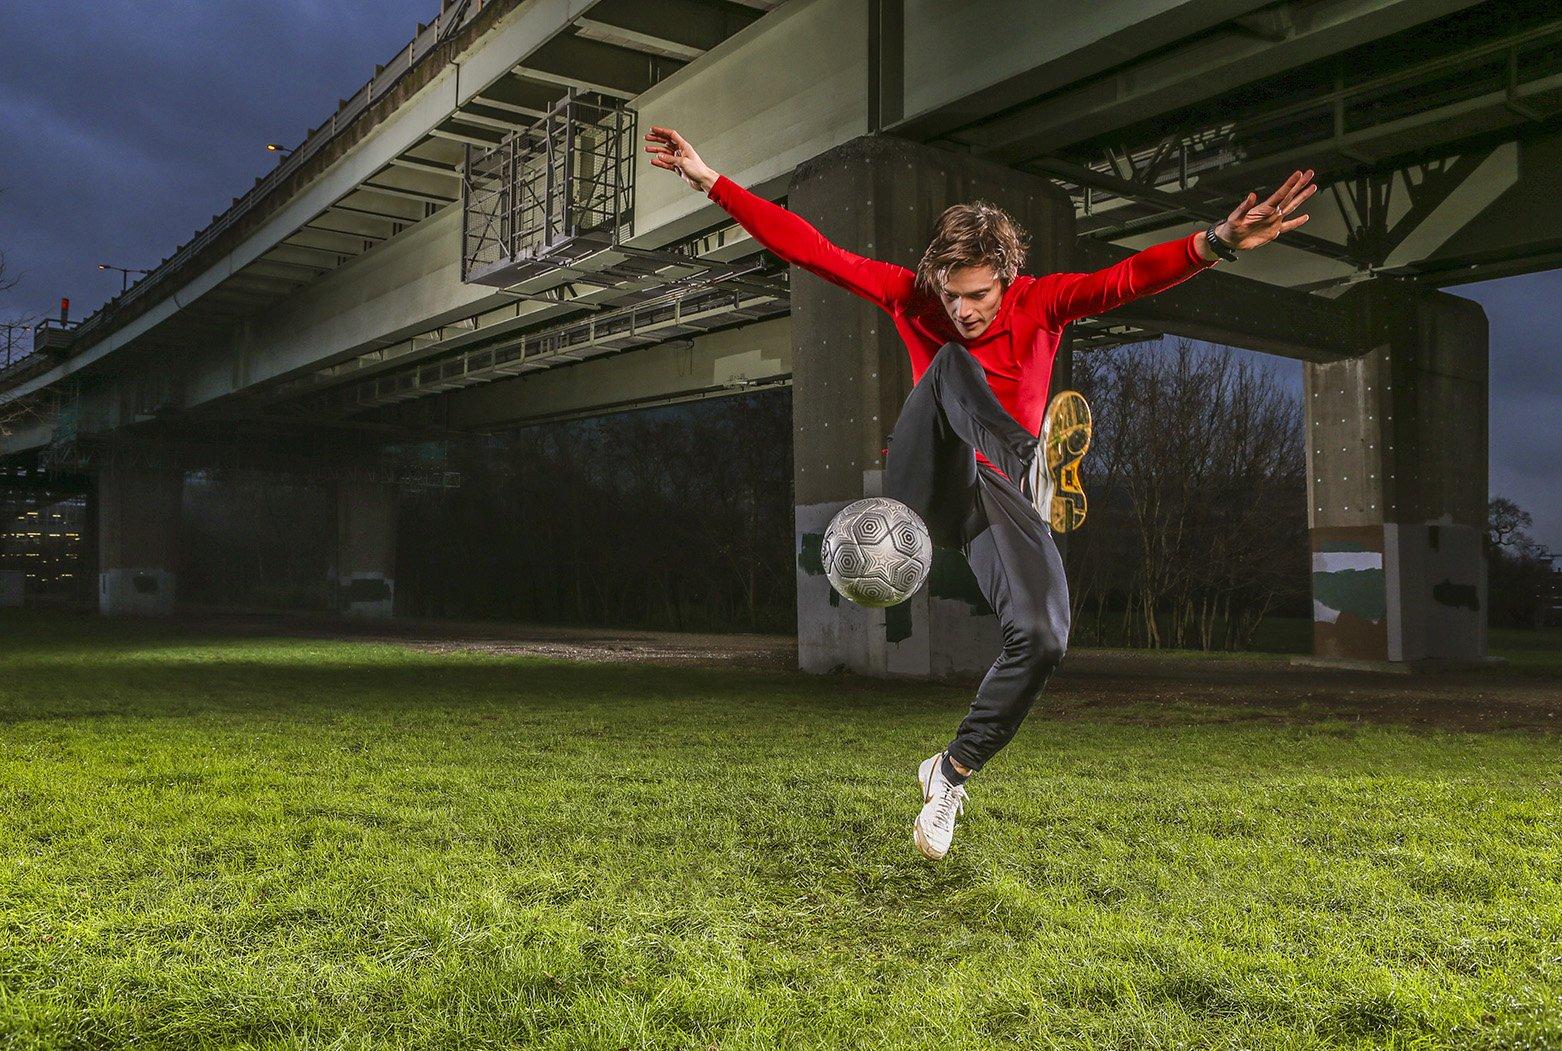 Soccer-Tricks-Final-John-Farnworth-8337